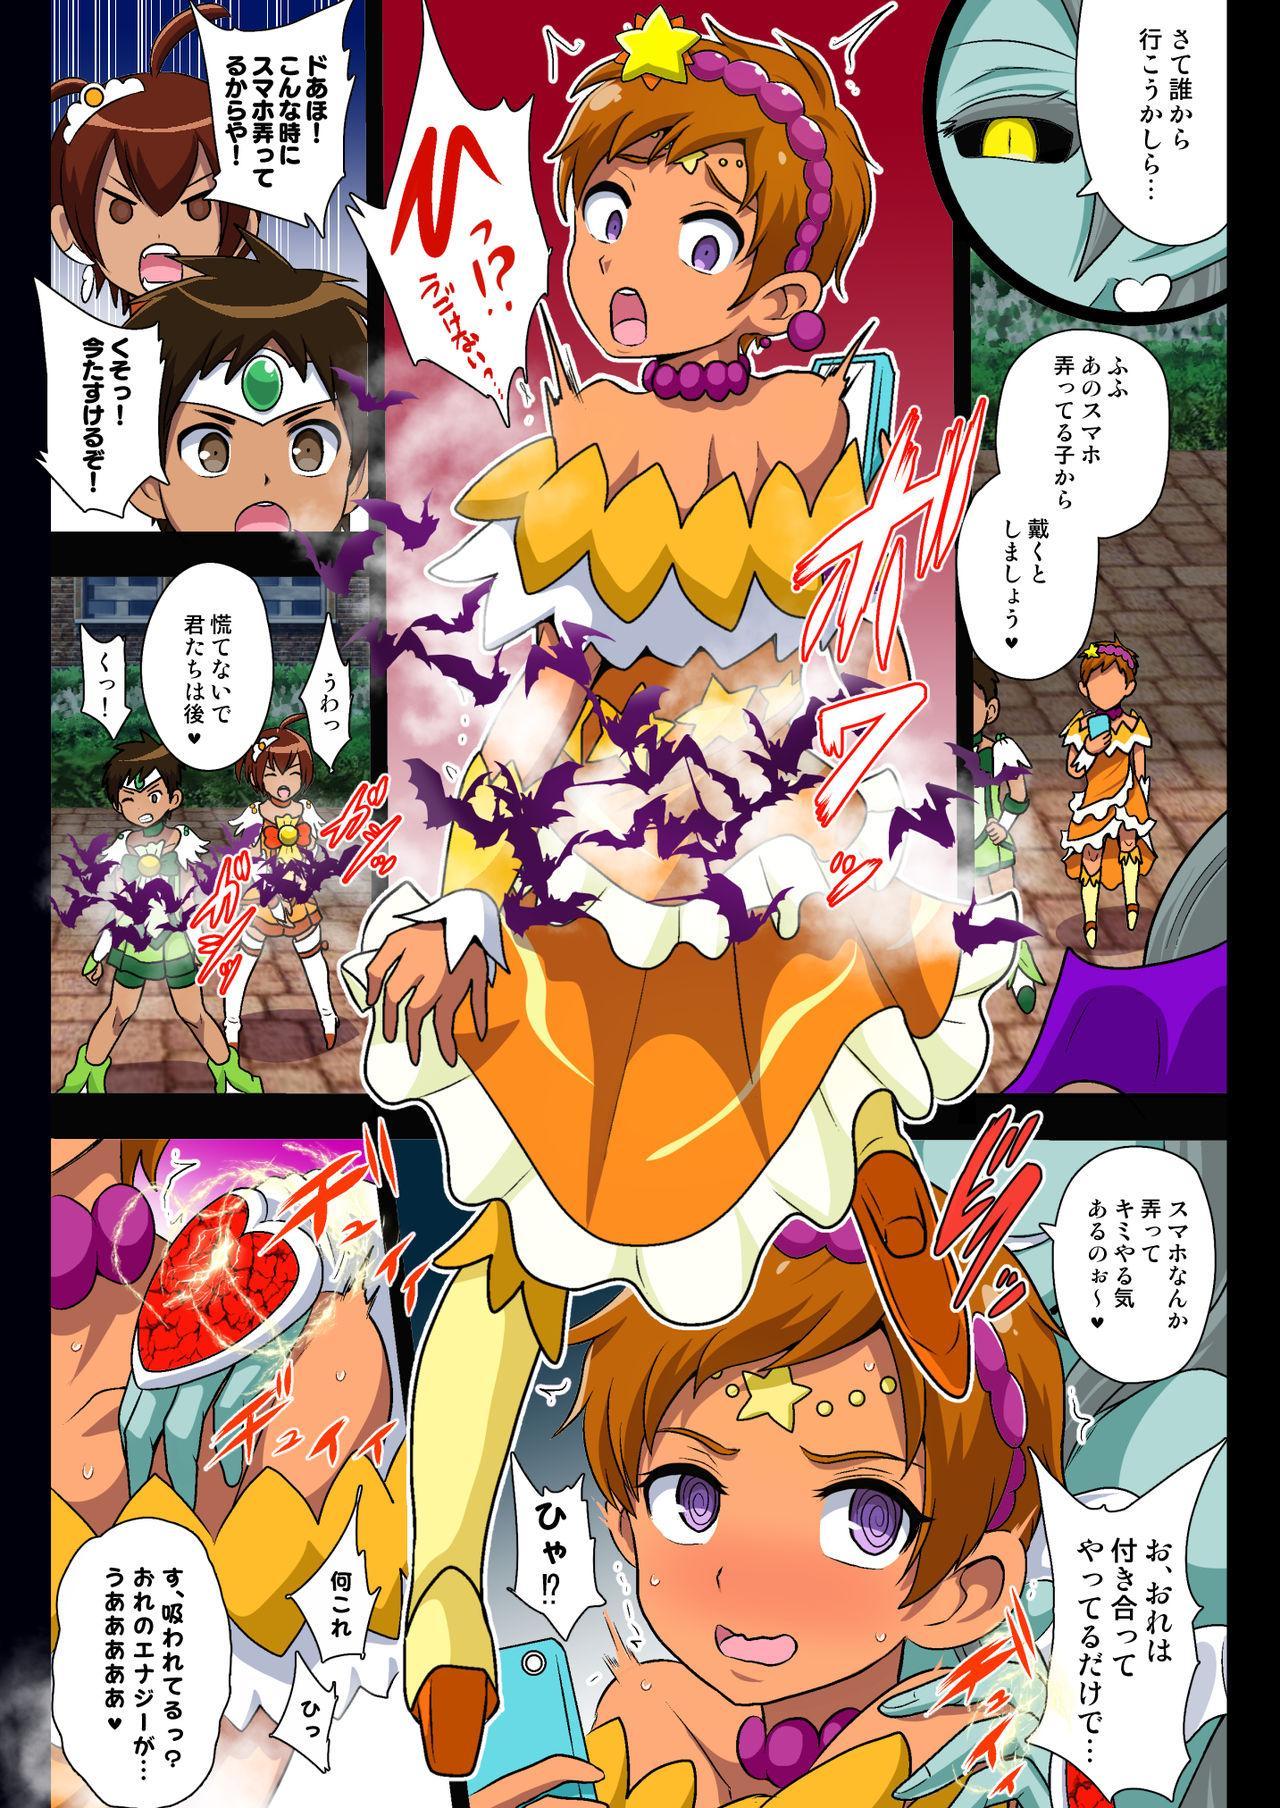 Preccubus v.s. Shota Cure 4